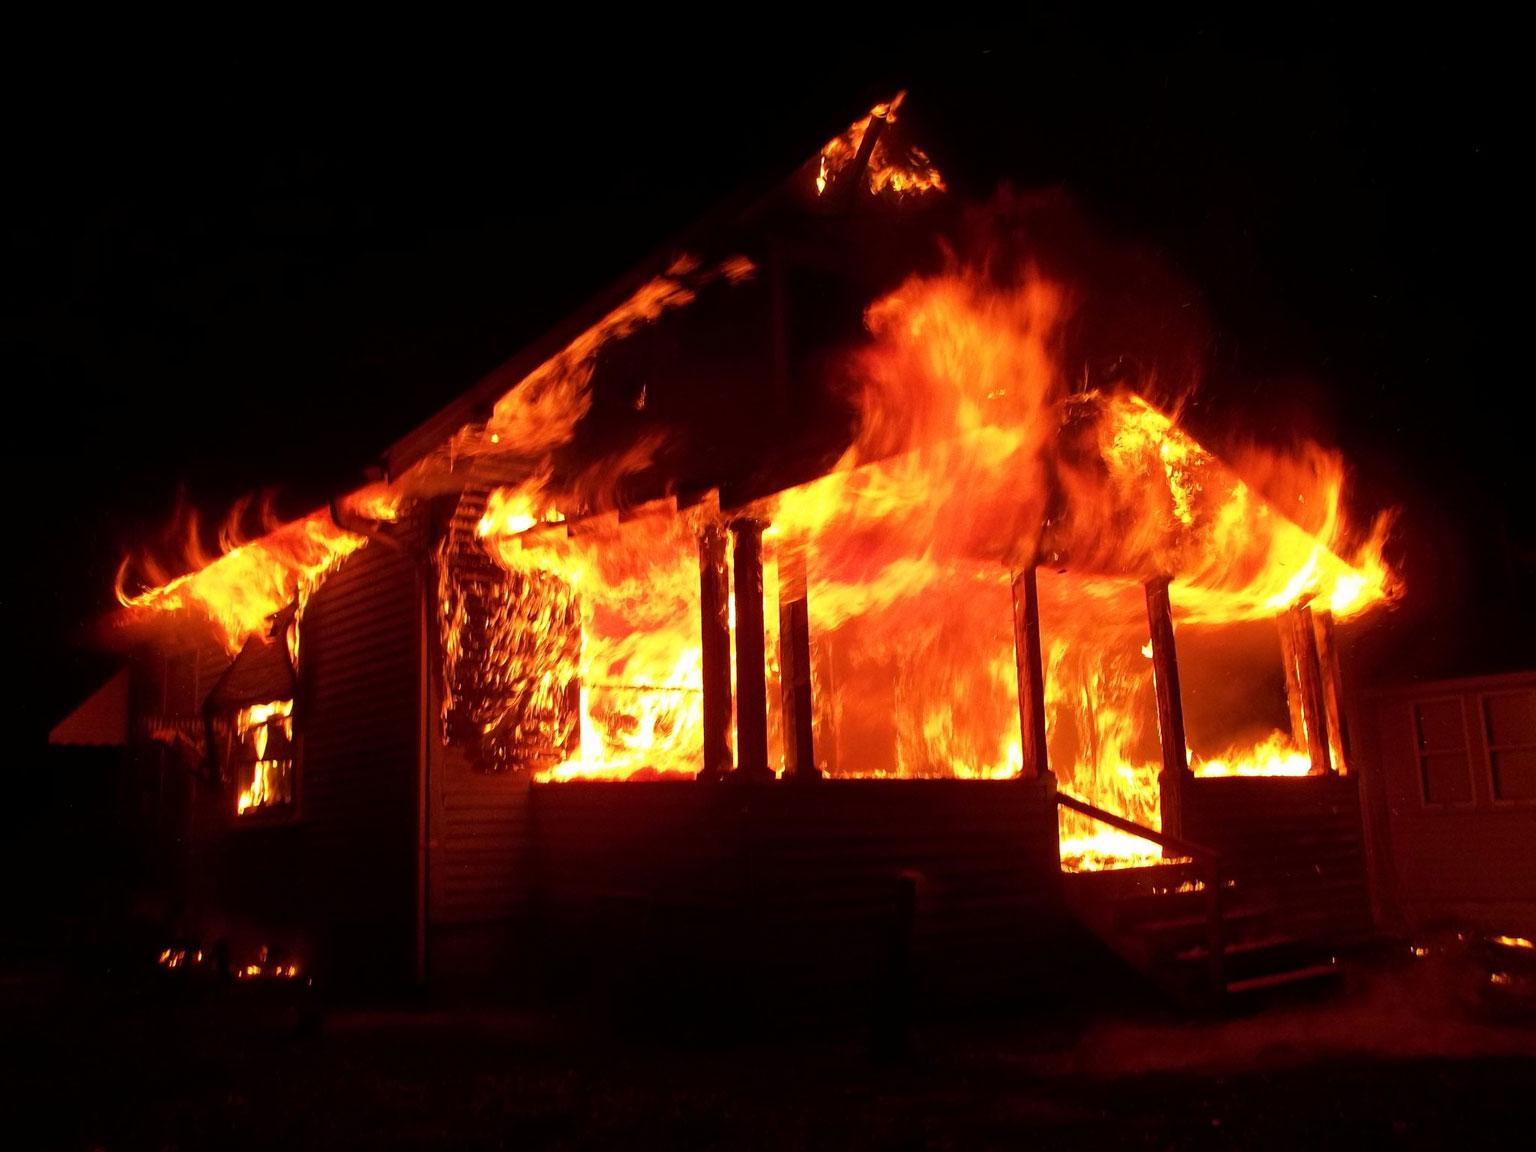 fire-home-1